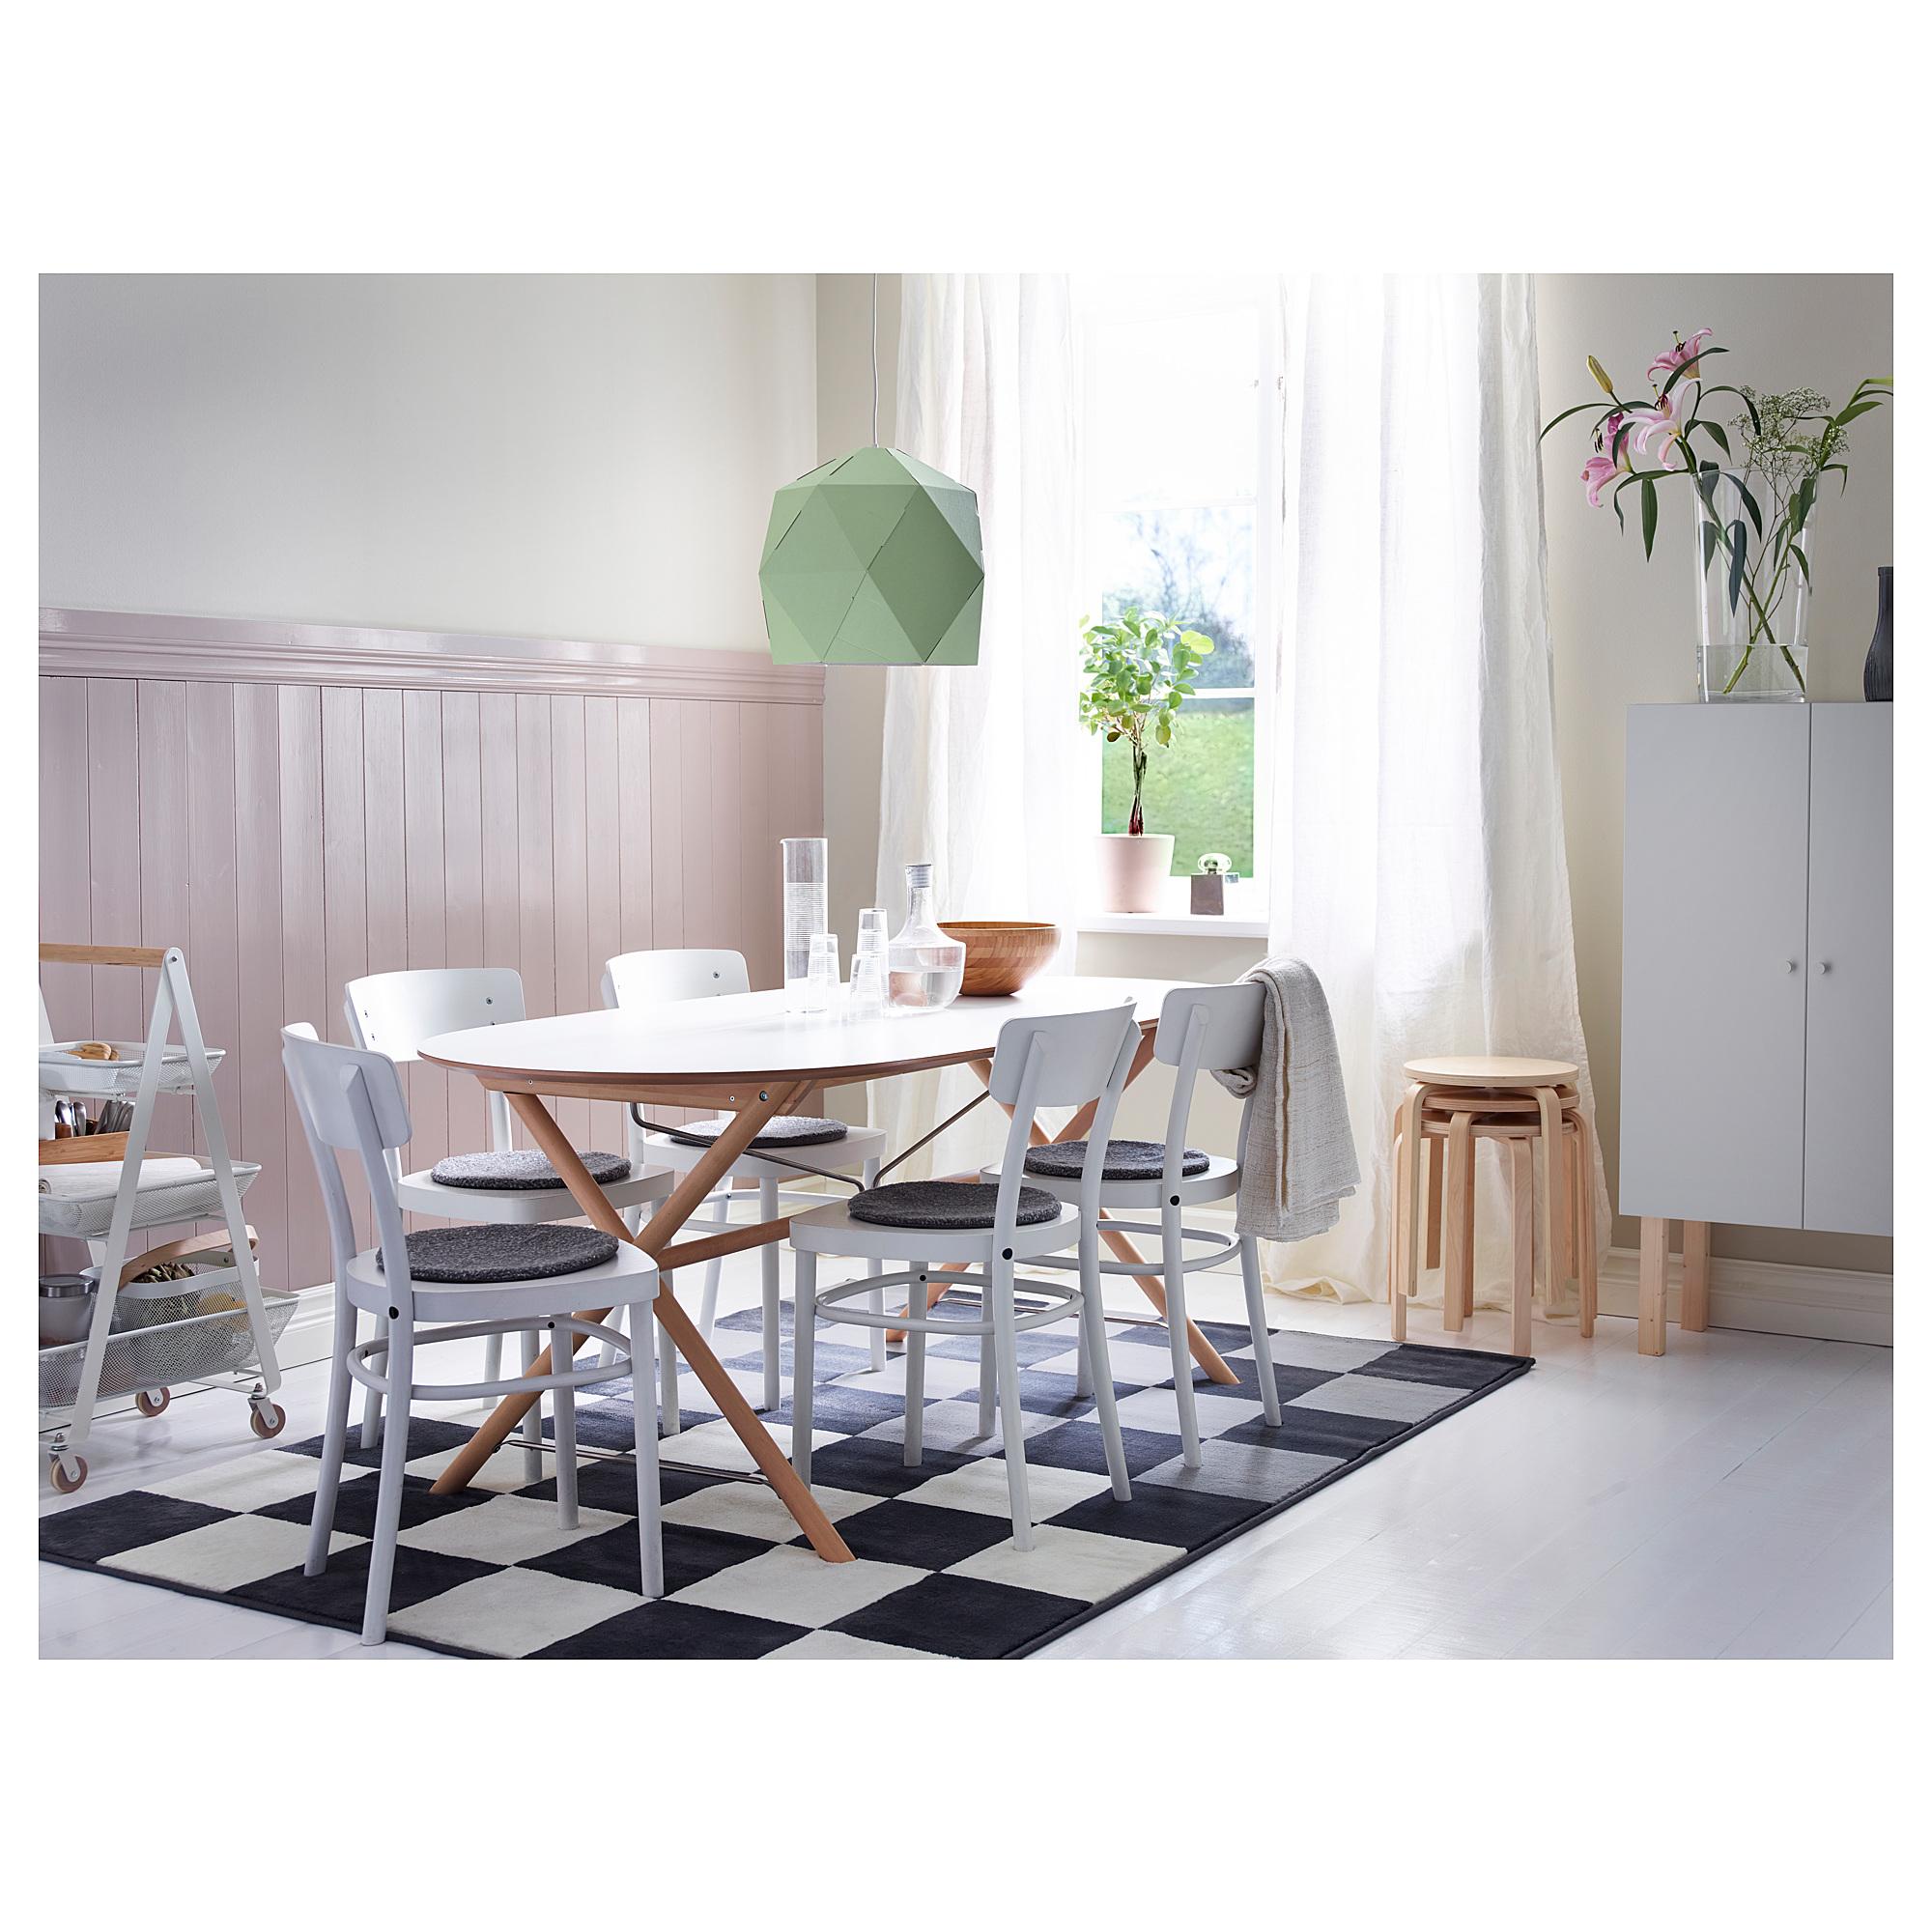 Fabulous Idolf Chair White Ikea Hong Kong Inzonedesignstudio Interior Chair Design Inzonedesignstudiocom